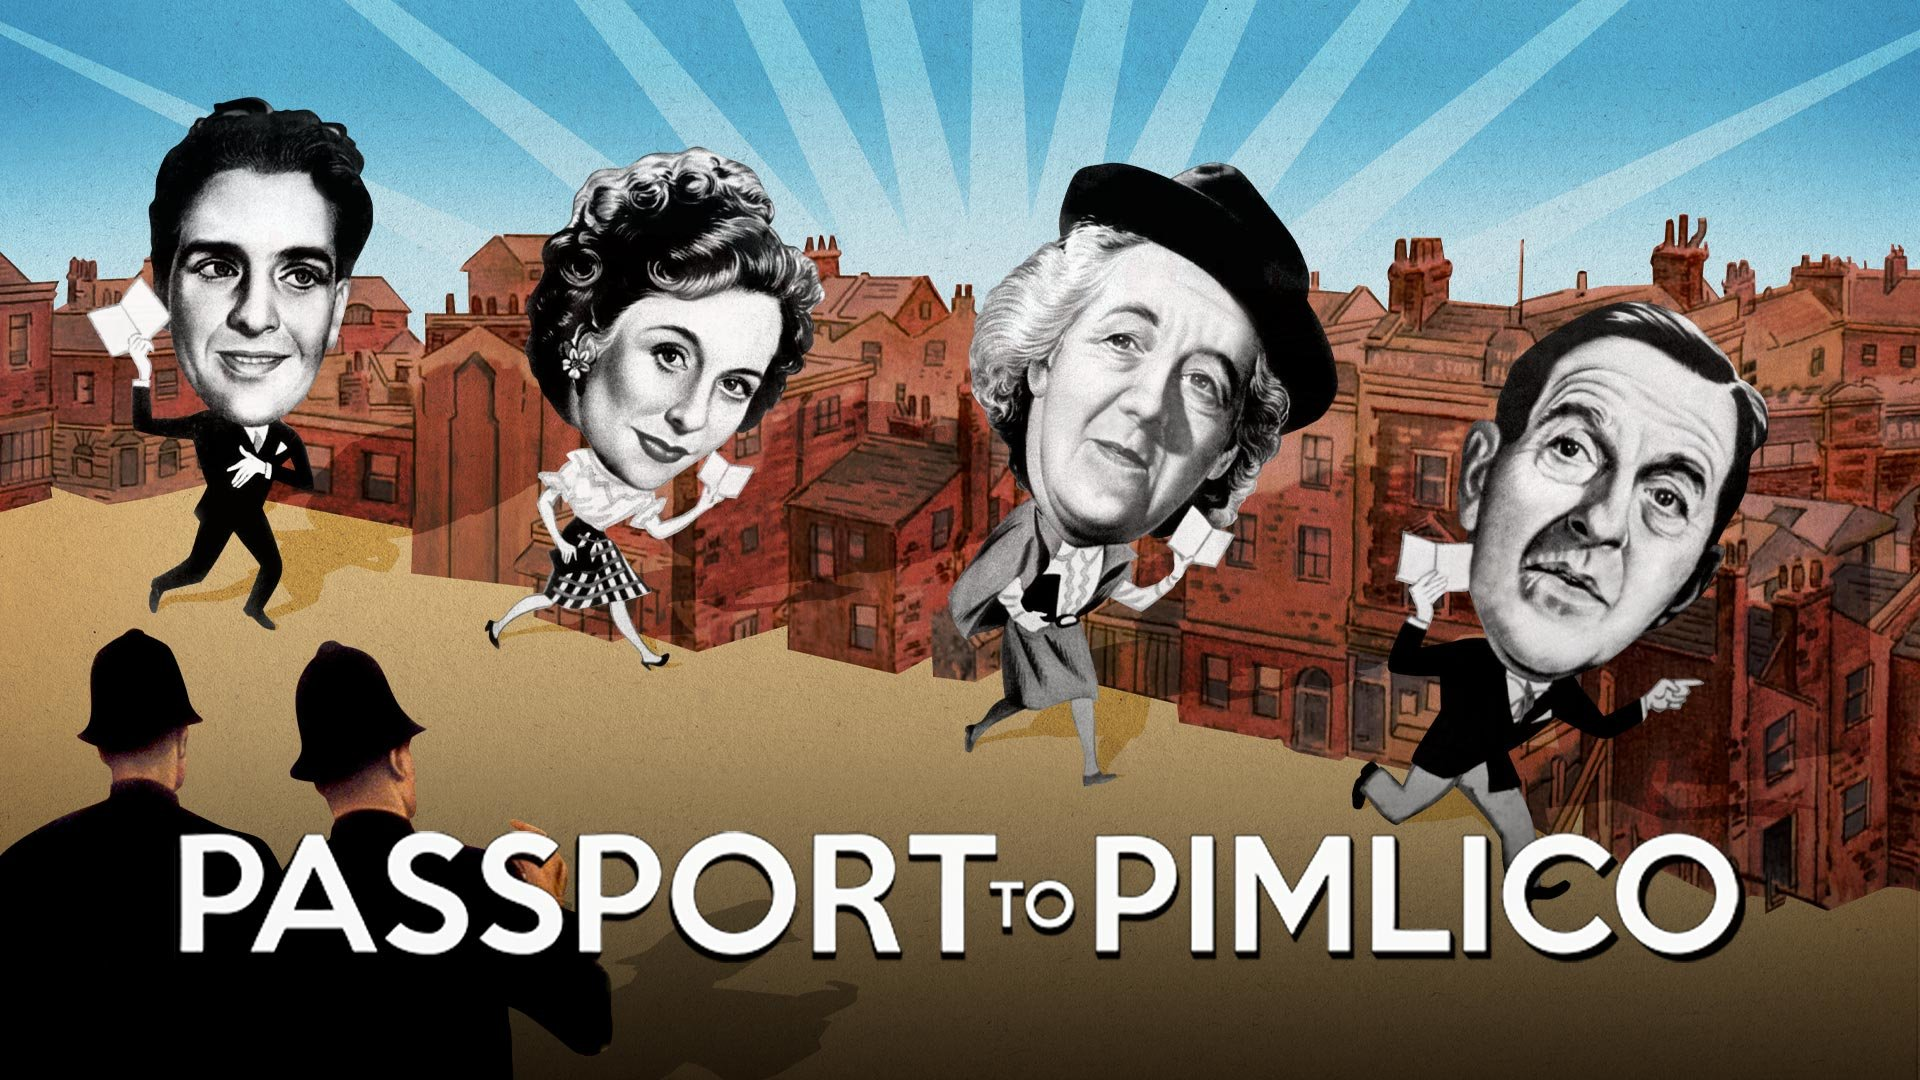 Passport to Pimlico on BritBox UK